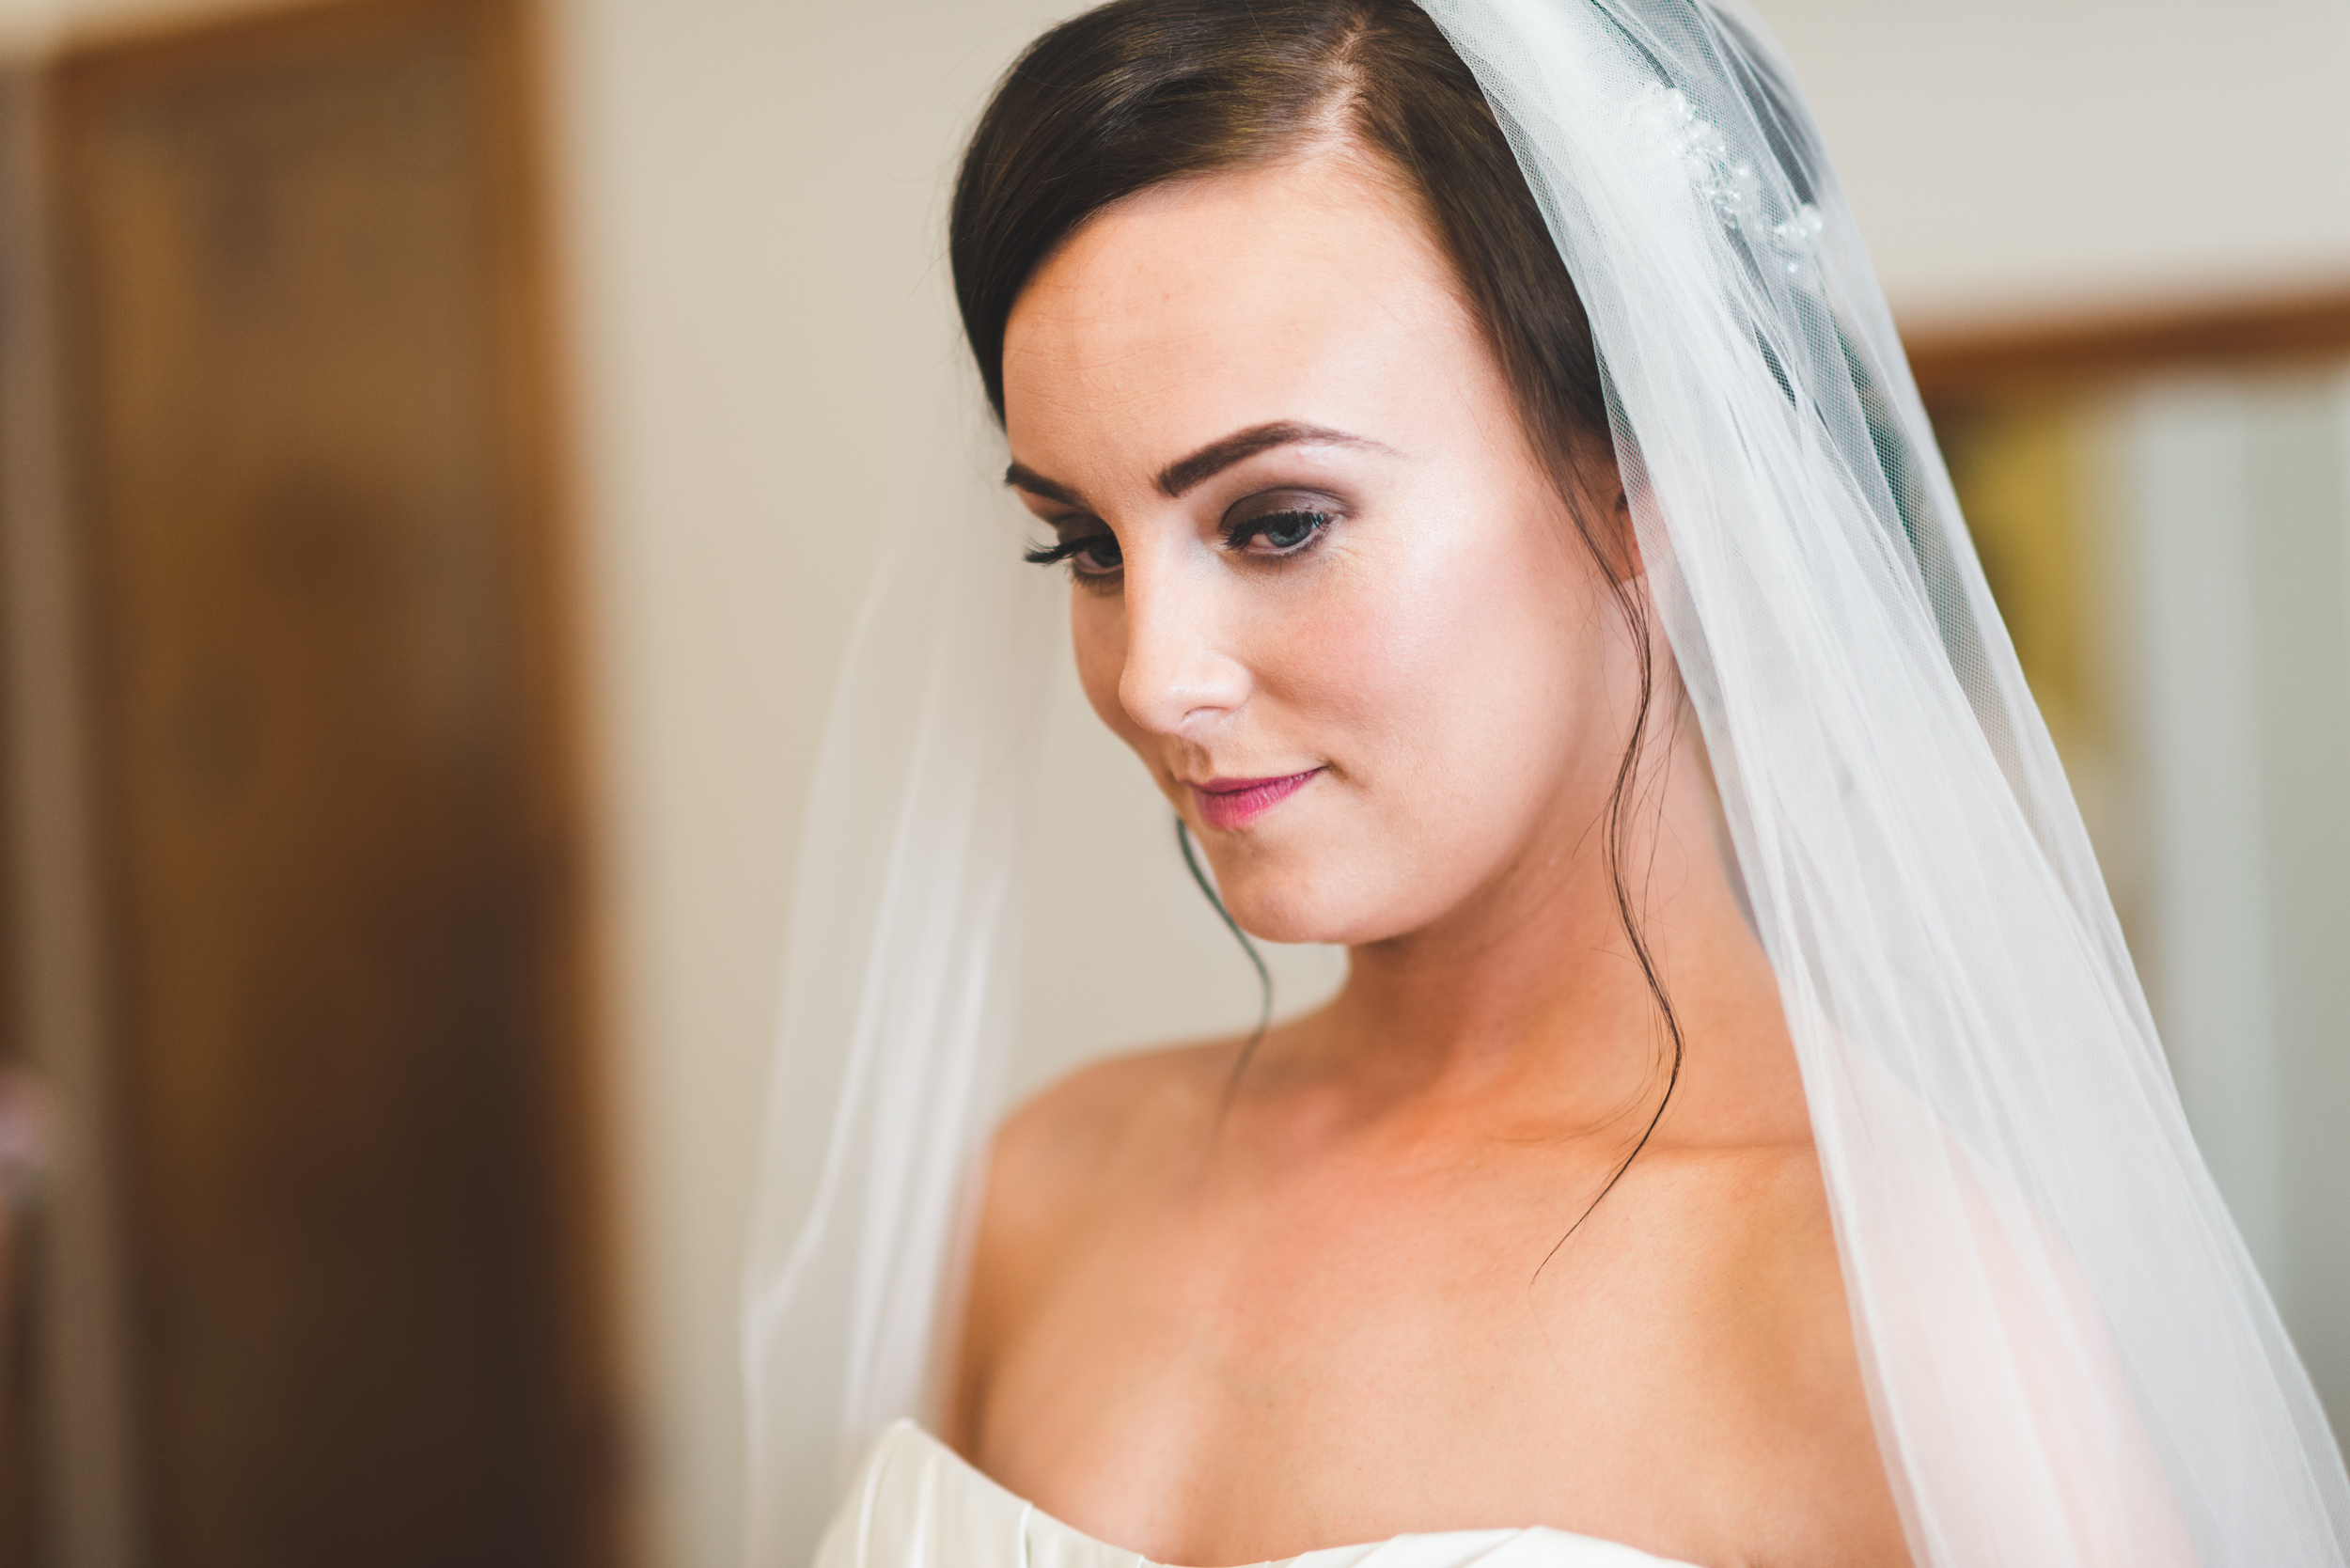 Northern_Ireland_Wedding_Photographer_Purephotoni_Dunsilly_Hotel_Bride_Ready